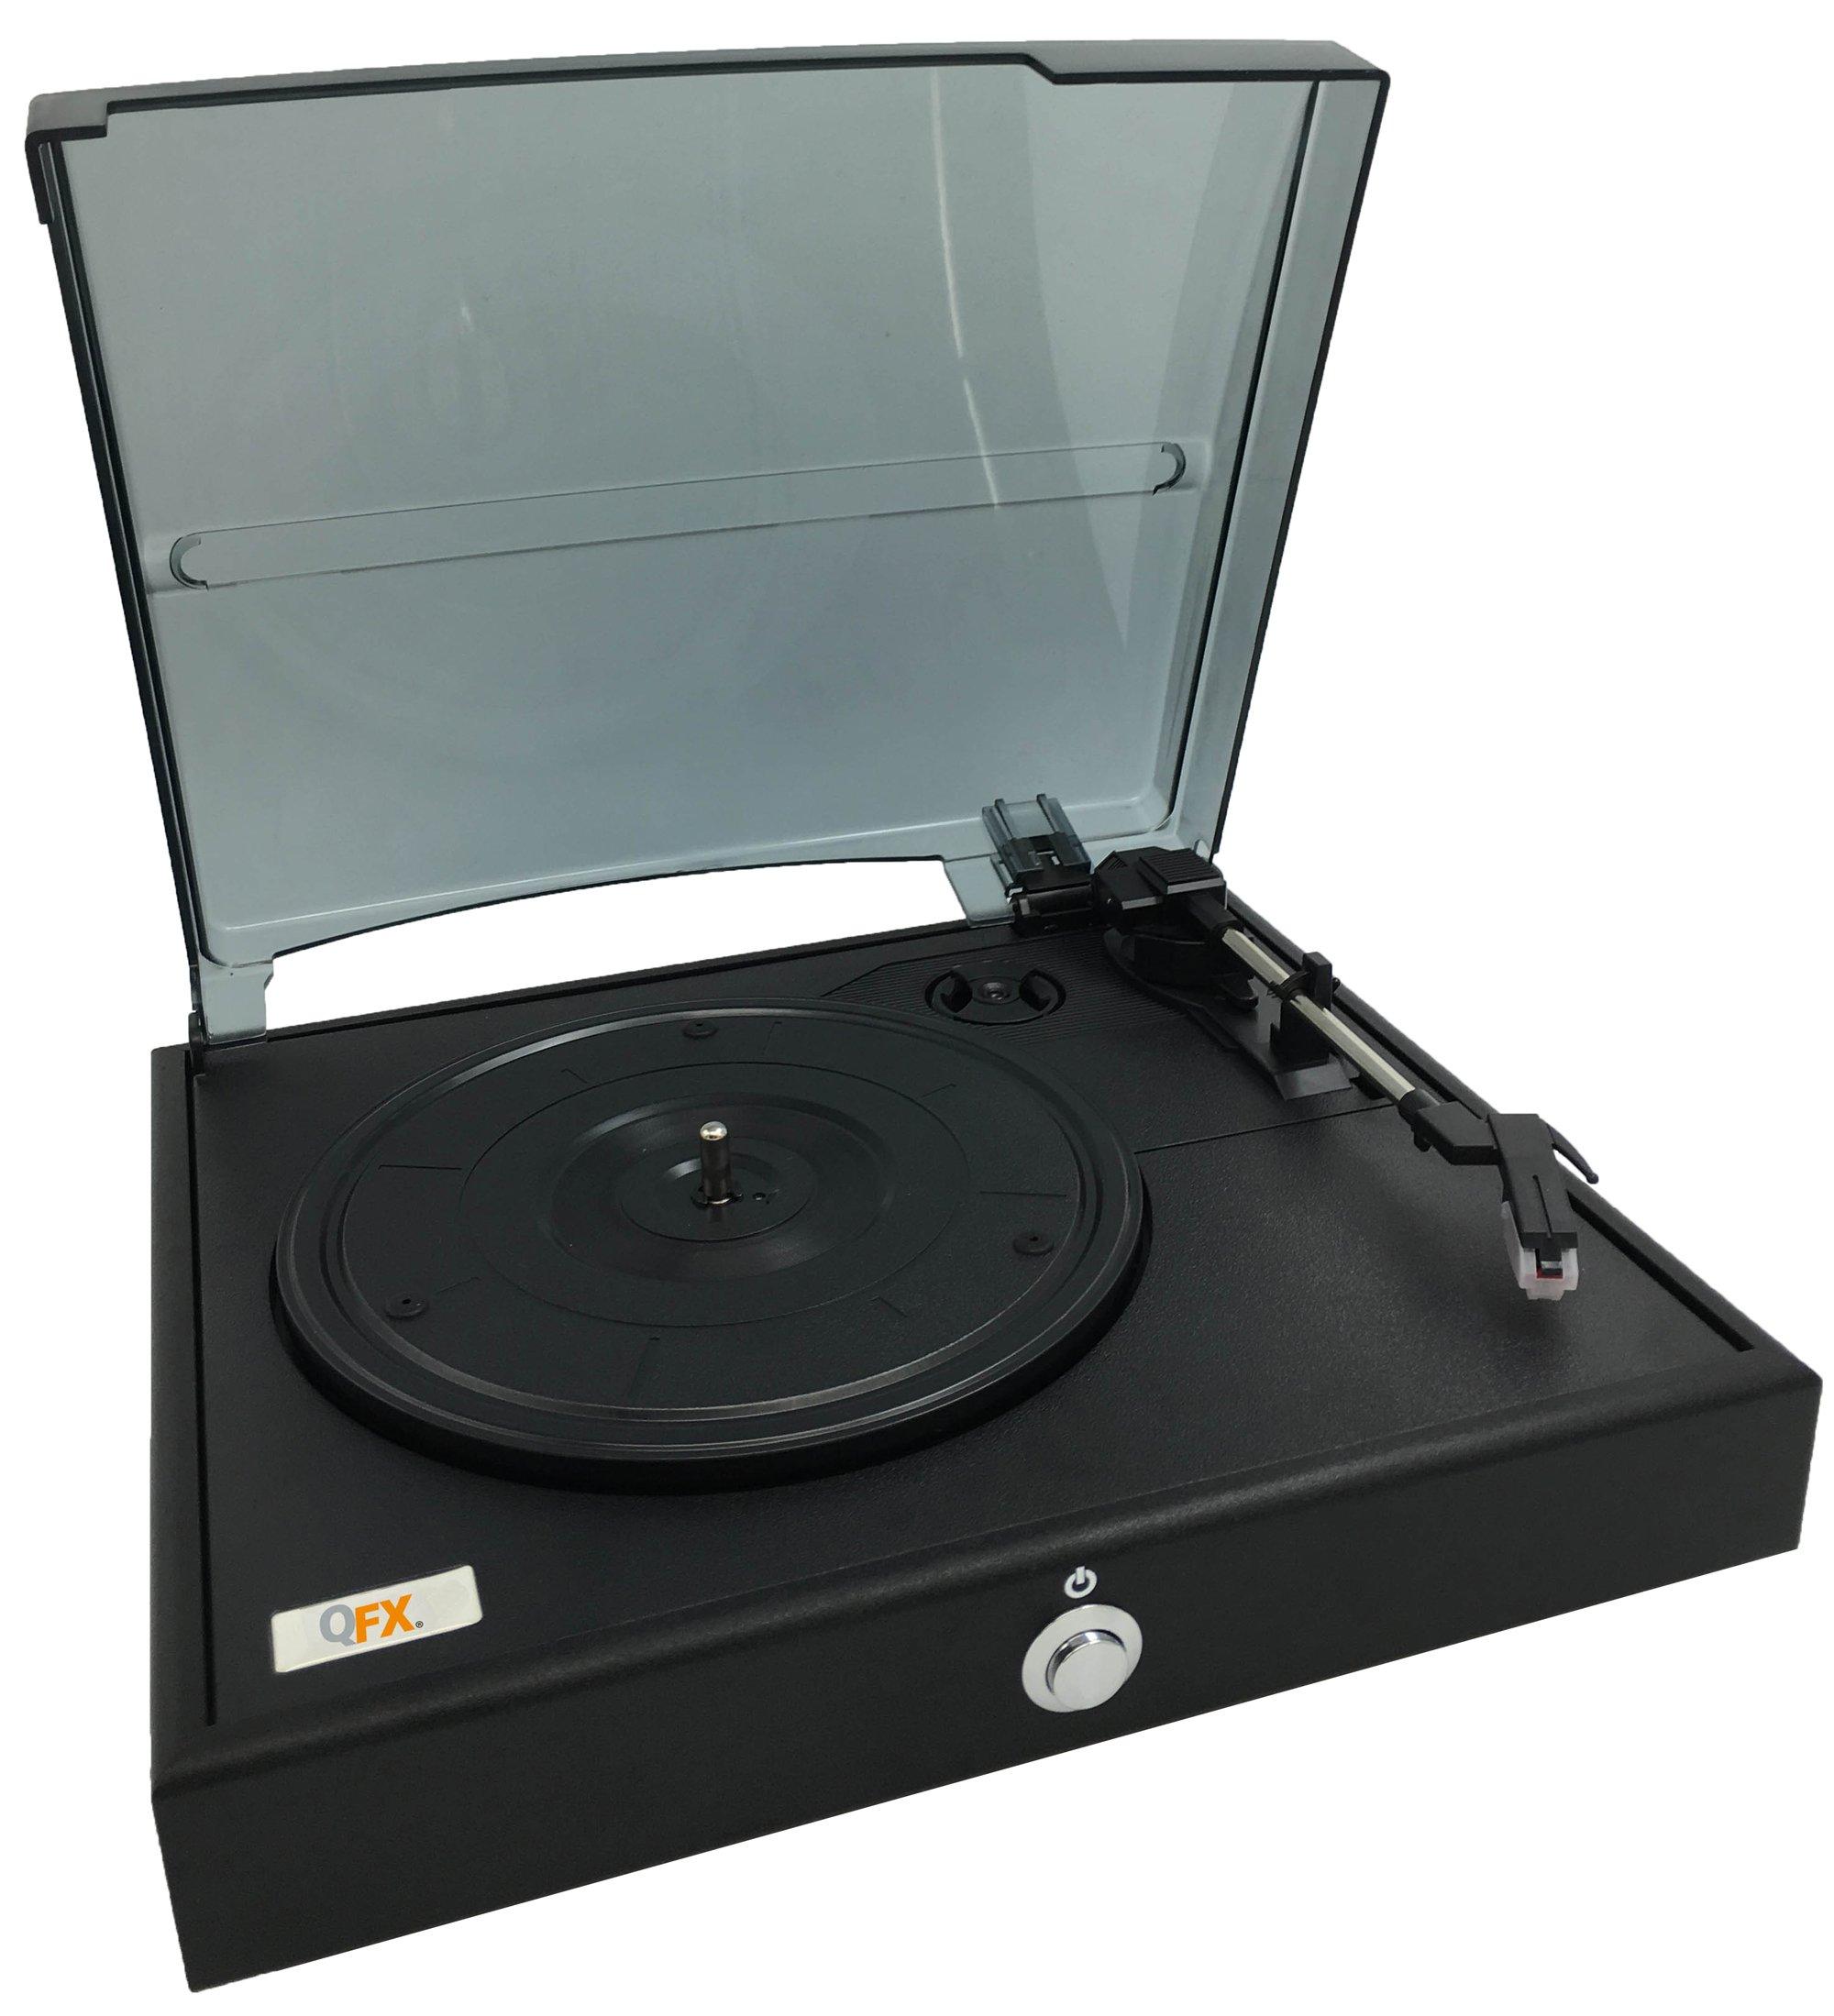 QFX Retro Turntable,Black (TURN-80)